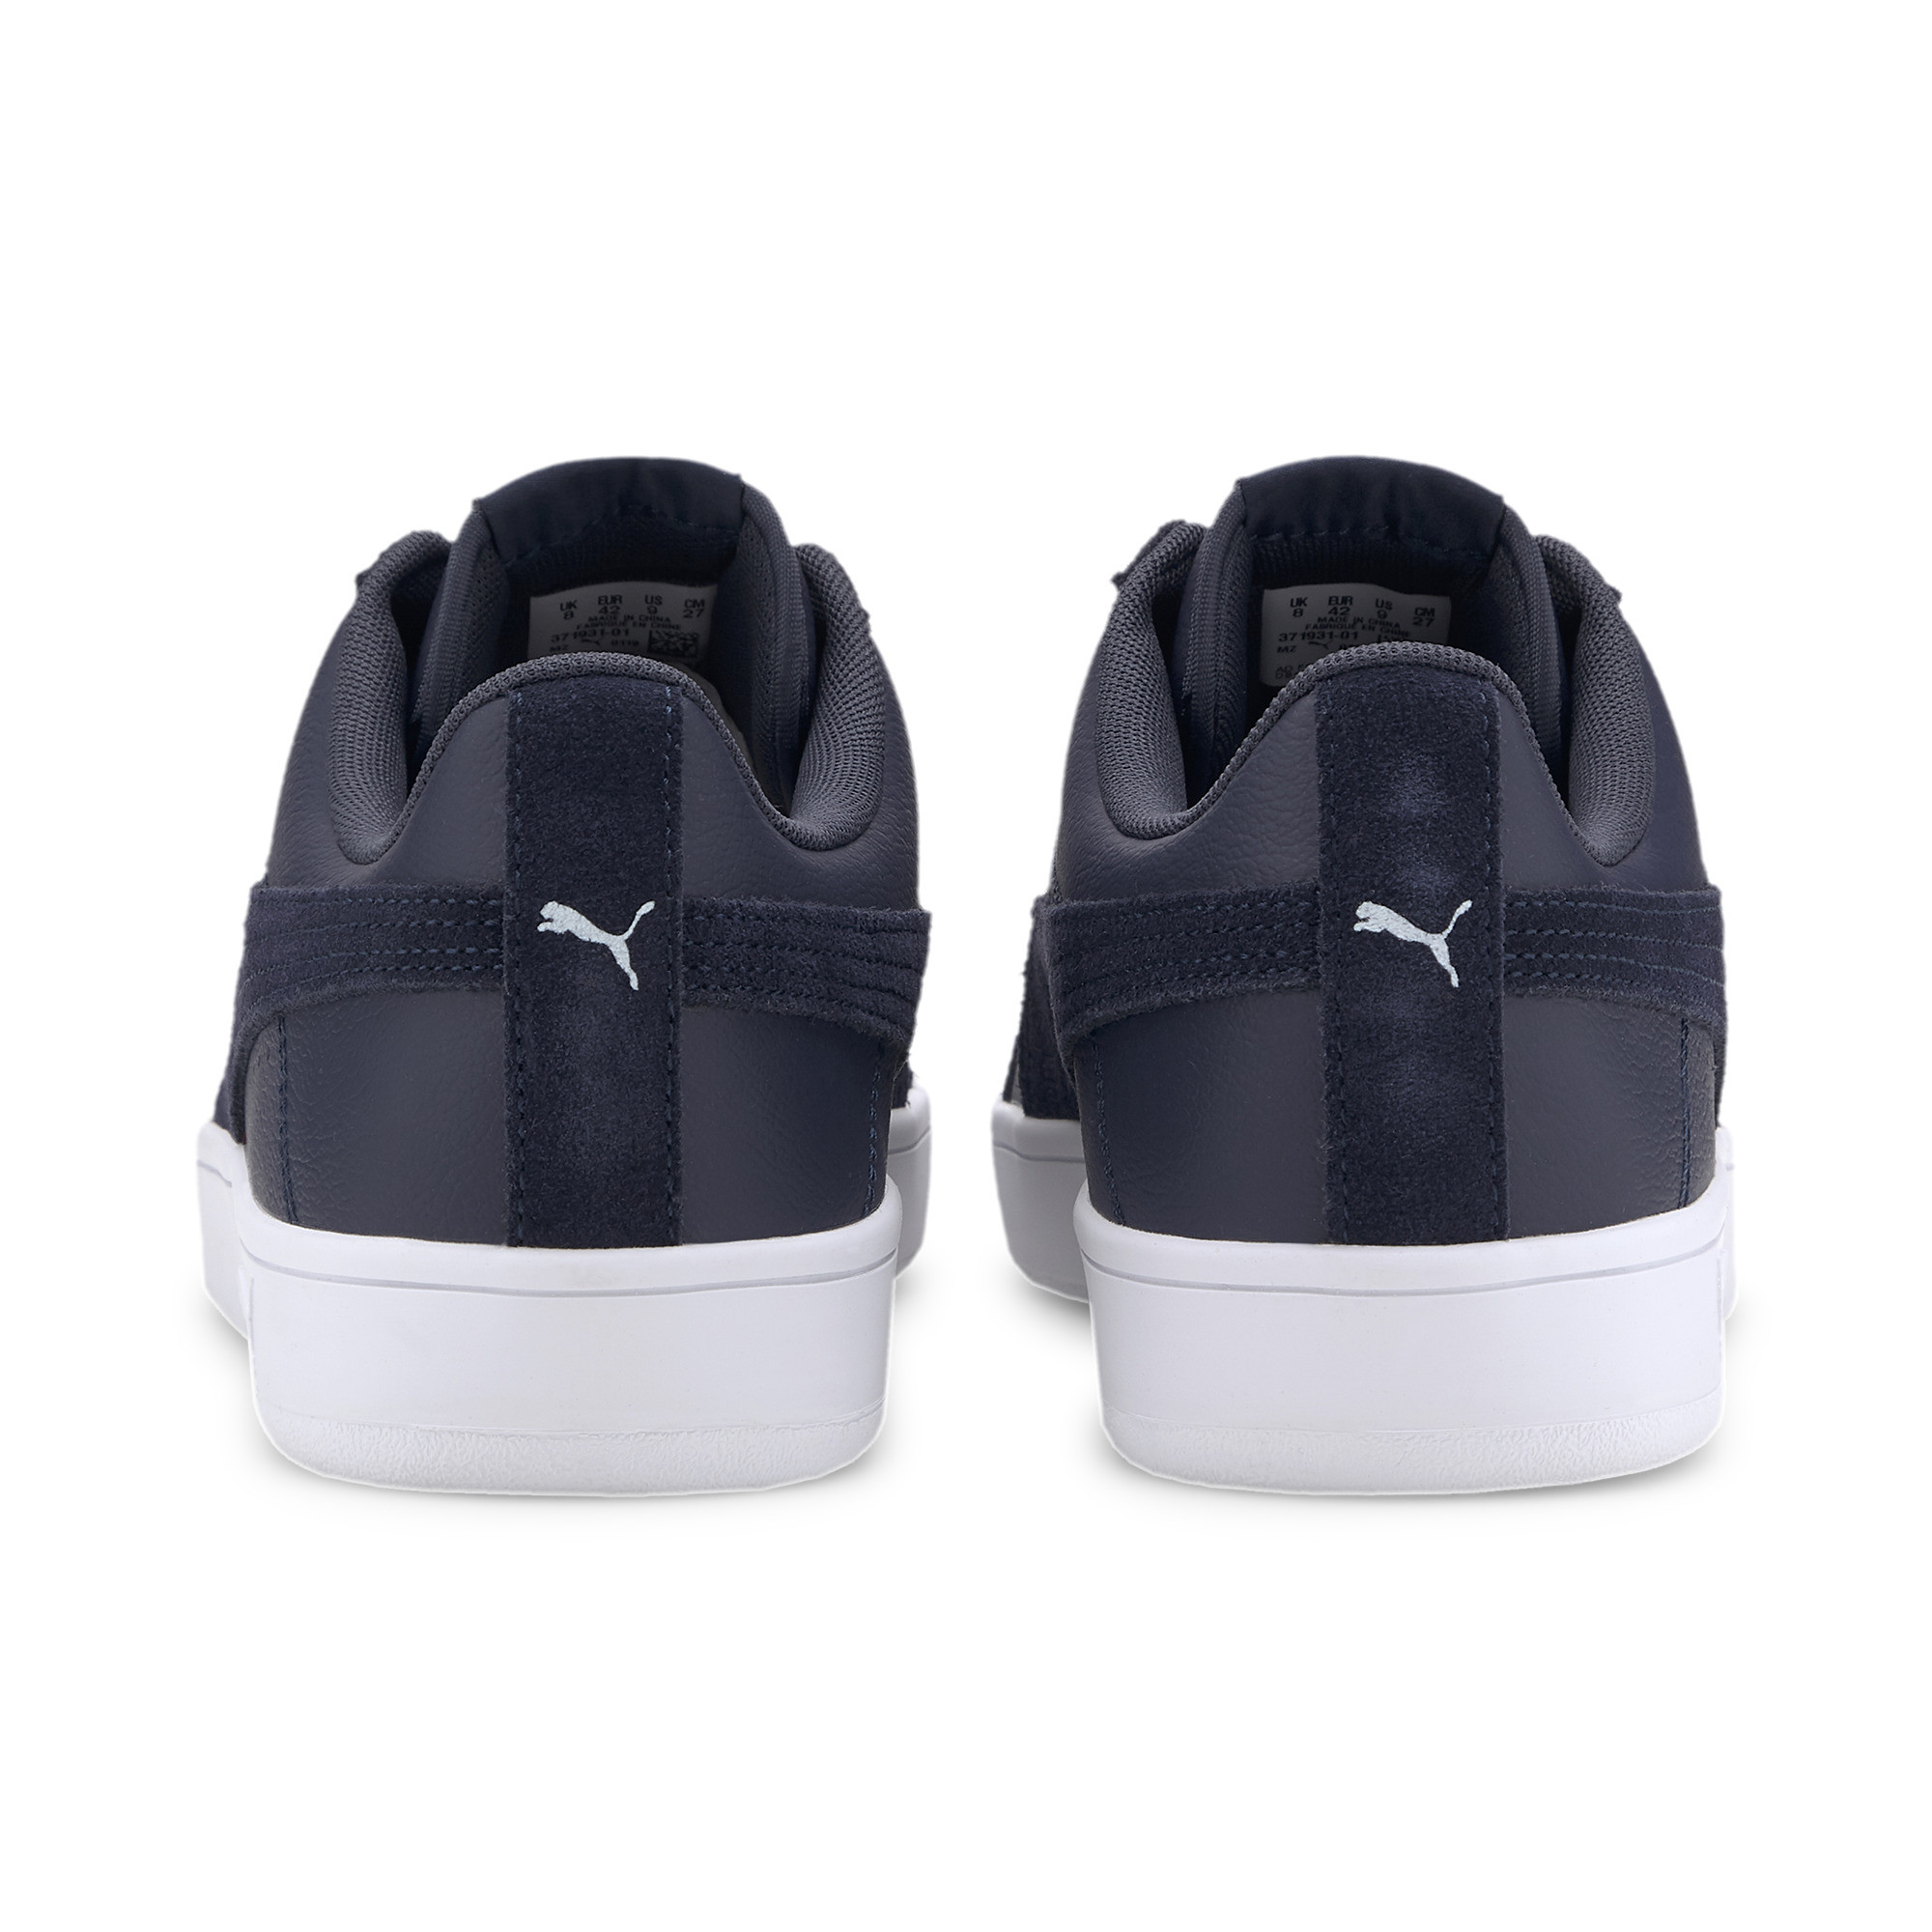 Indexbild 15 - PUMA Court Legend Lo Sneaker Unisex Schuhe Basics Neu